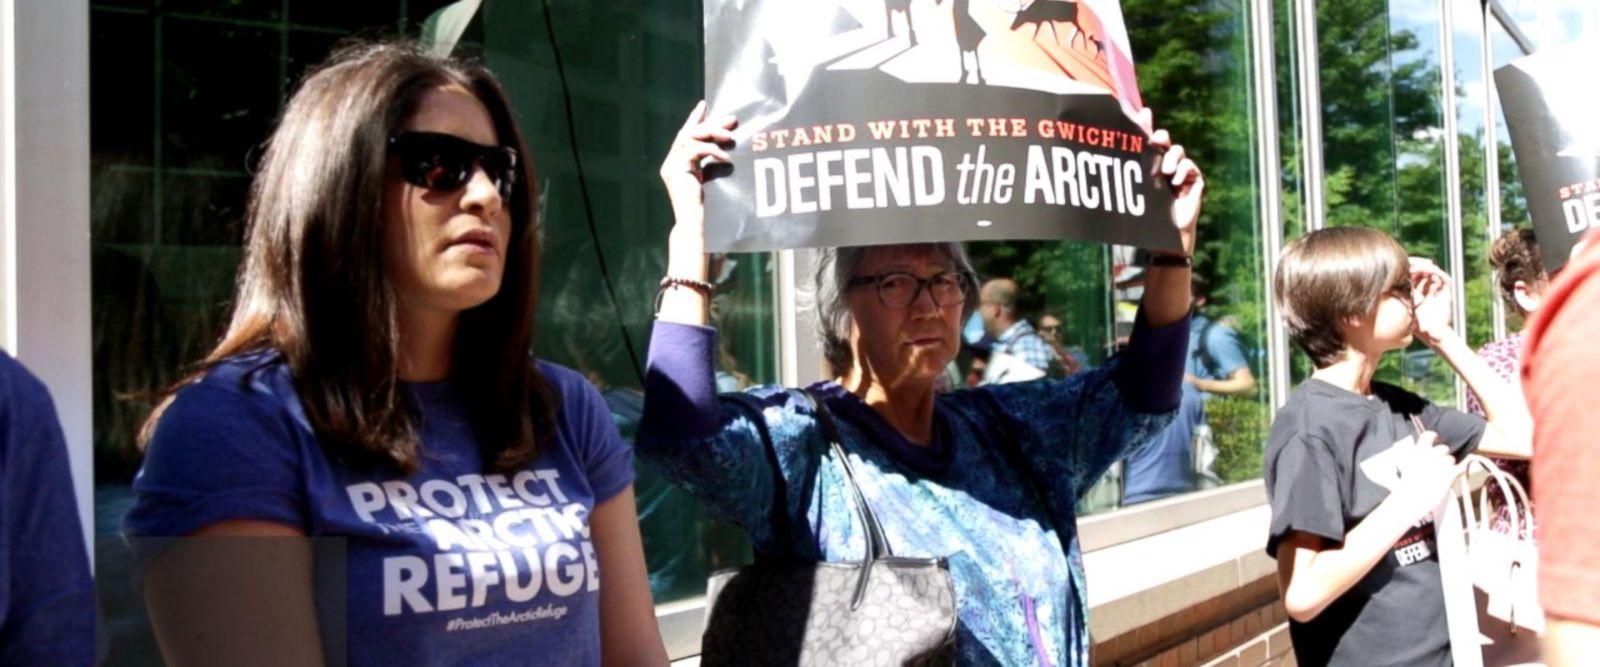 VIDEO: Protests heat up opposing Alaskan Arctic refuge drilling